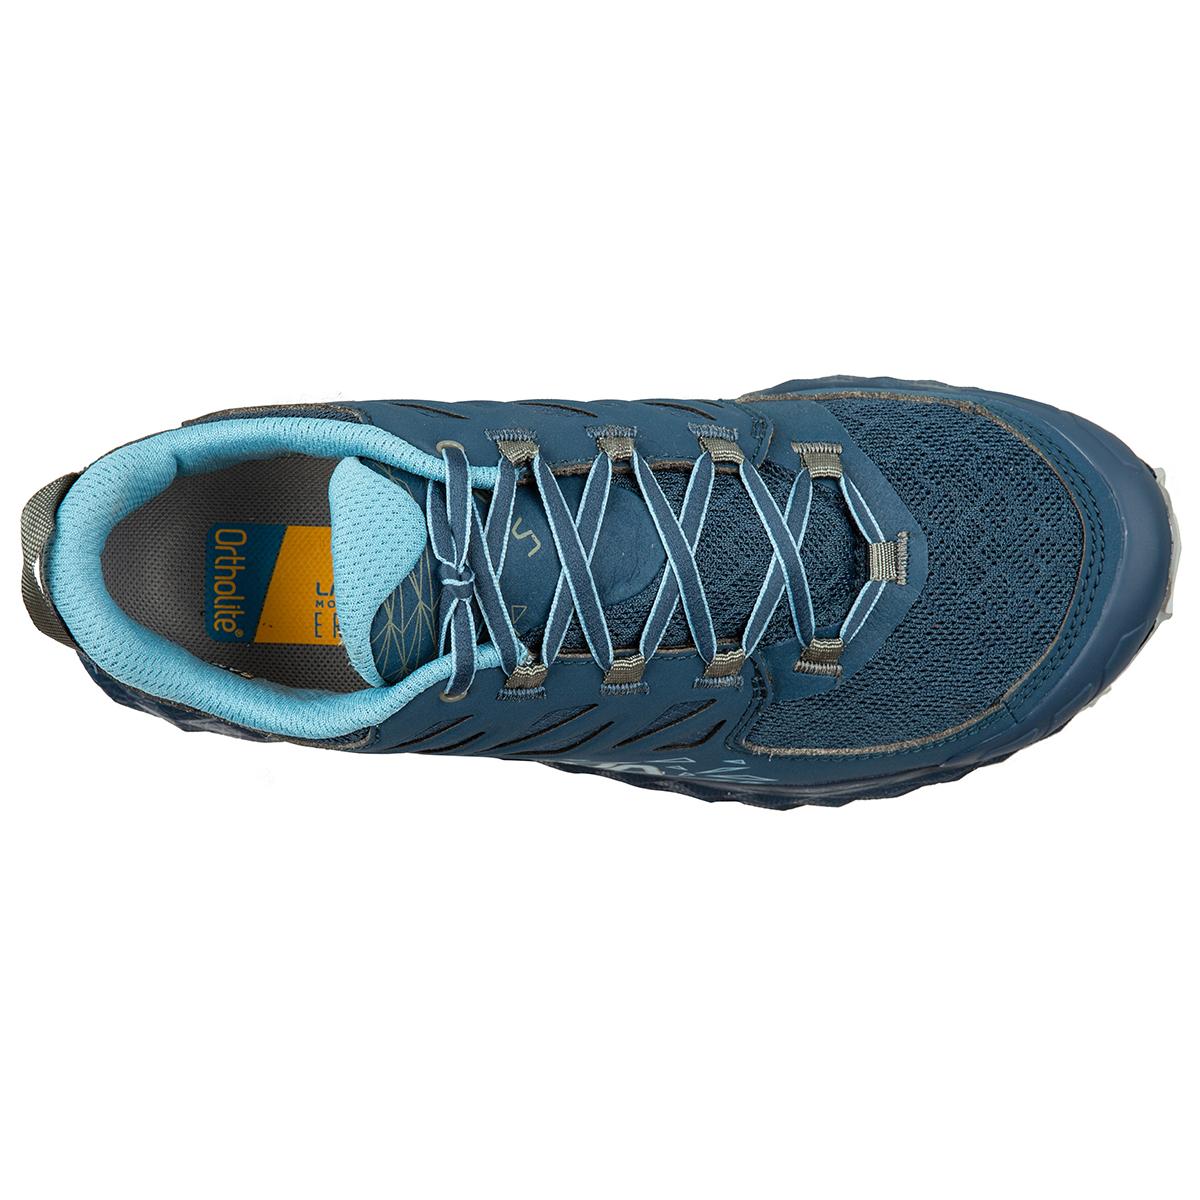 Women's La Sportiva Lycan II Trail Running Shoe - Color: Opal/Pacific Blue - Size: 6.5 - Width: Regular, Opal/Pacific Blue, large, image 3